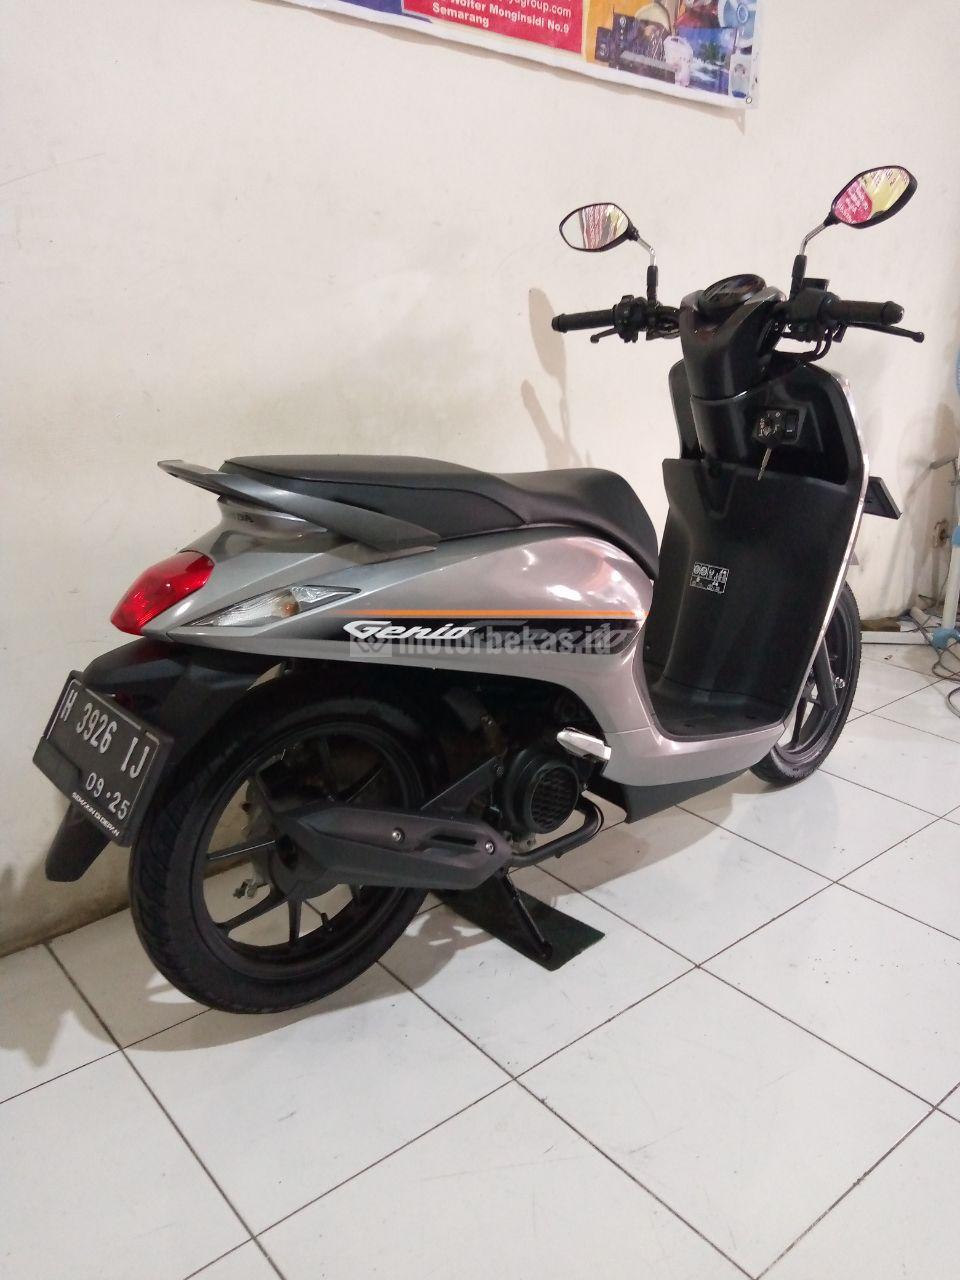 HONDA GENIO  3320 motorbekas.id